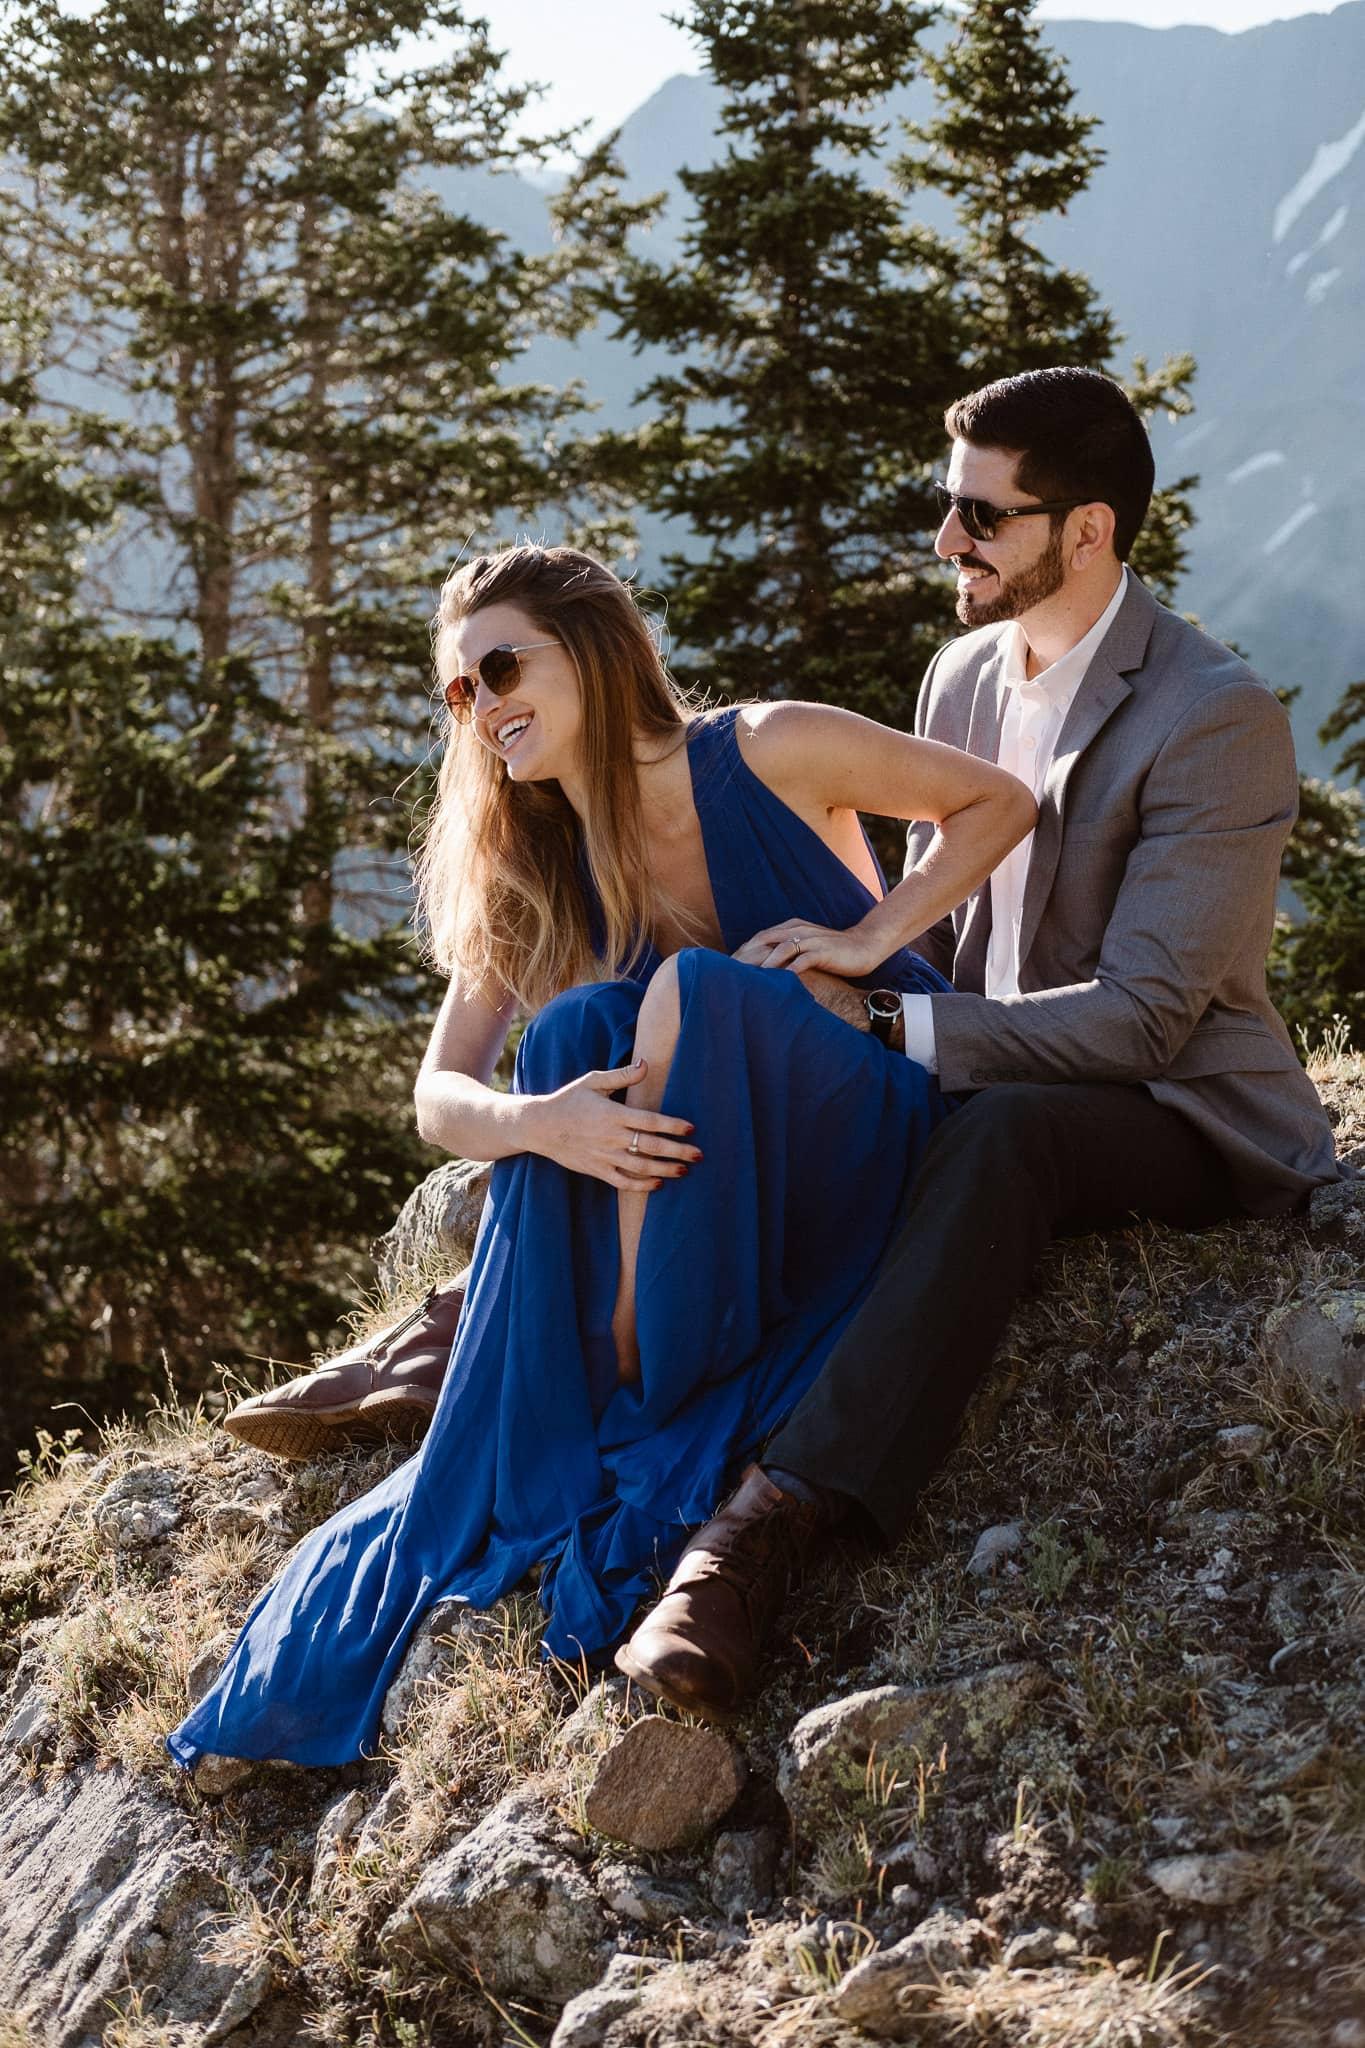 Colorado adventure engagement photography, Loveland Pass mountain alpine lake elopement, Summit County wedding photographer